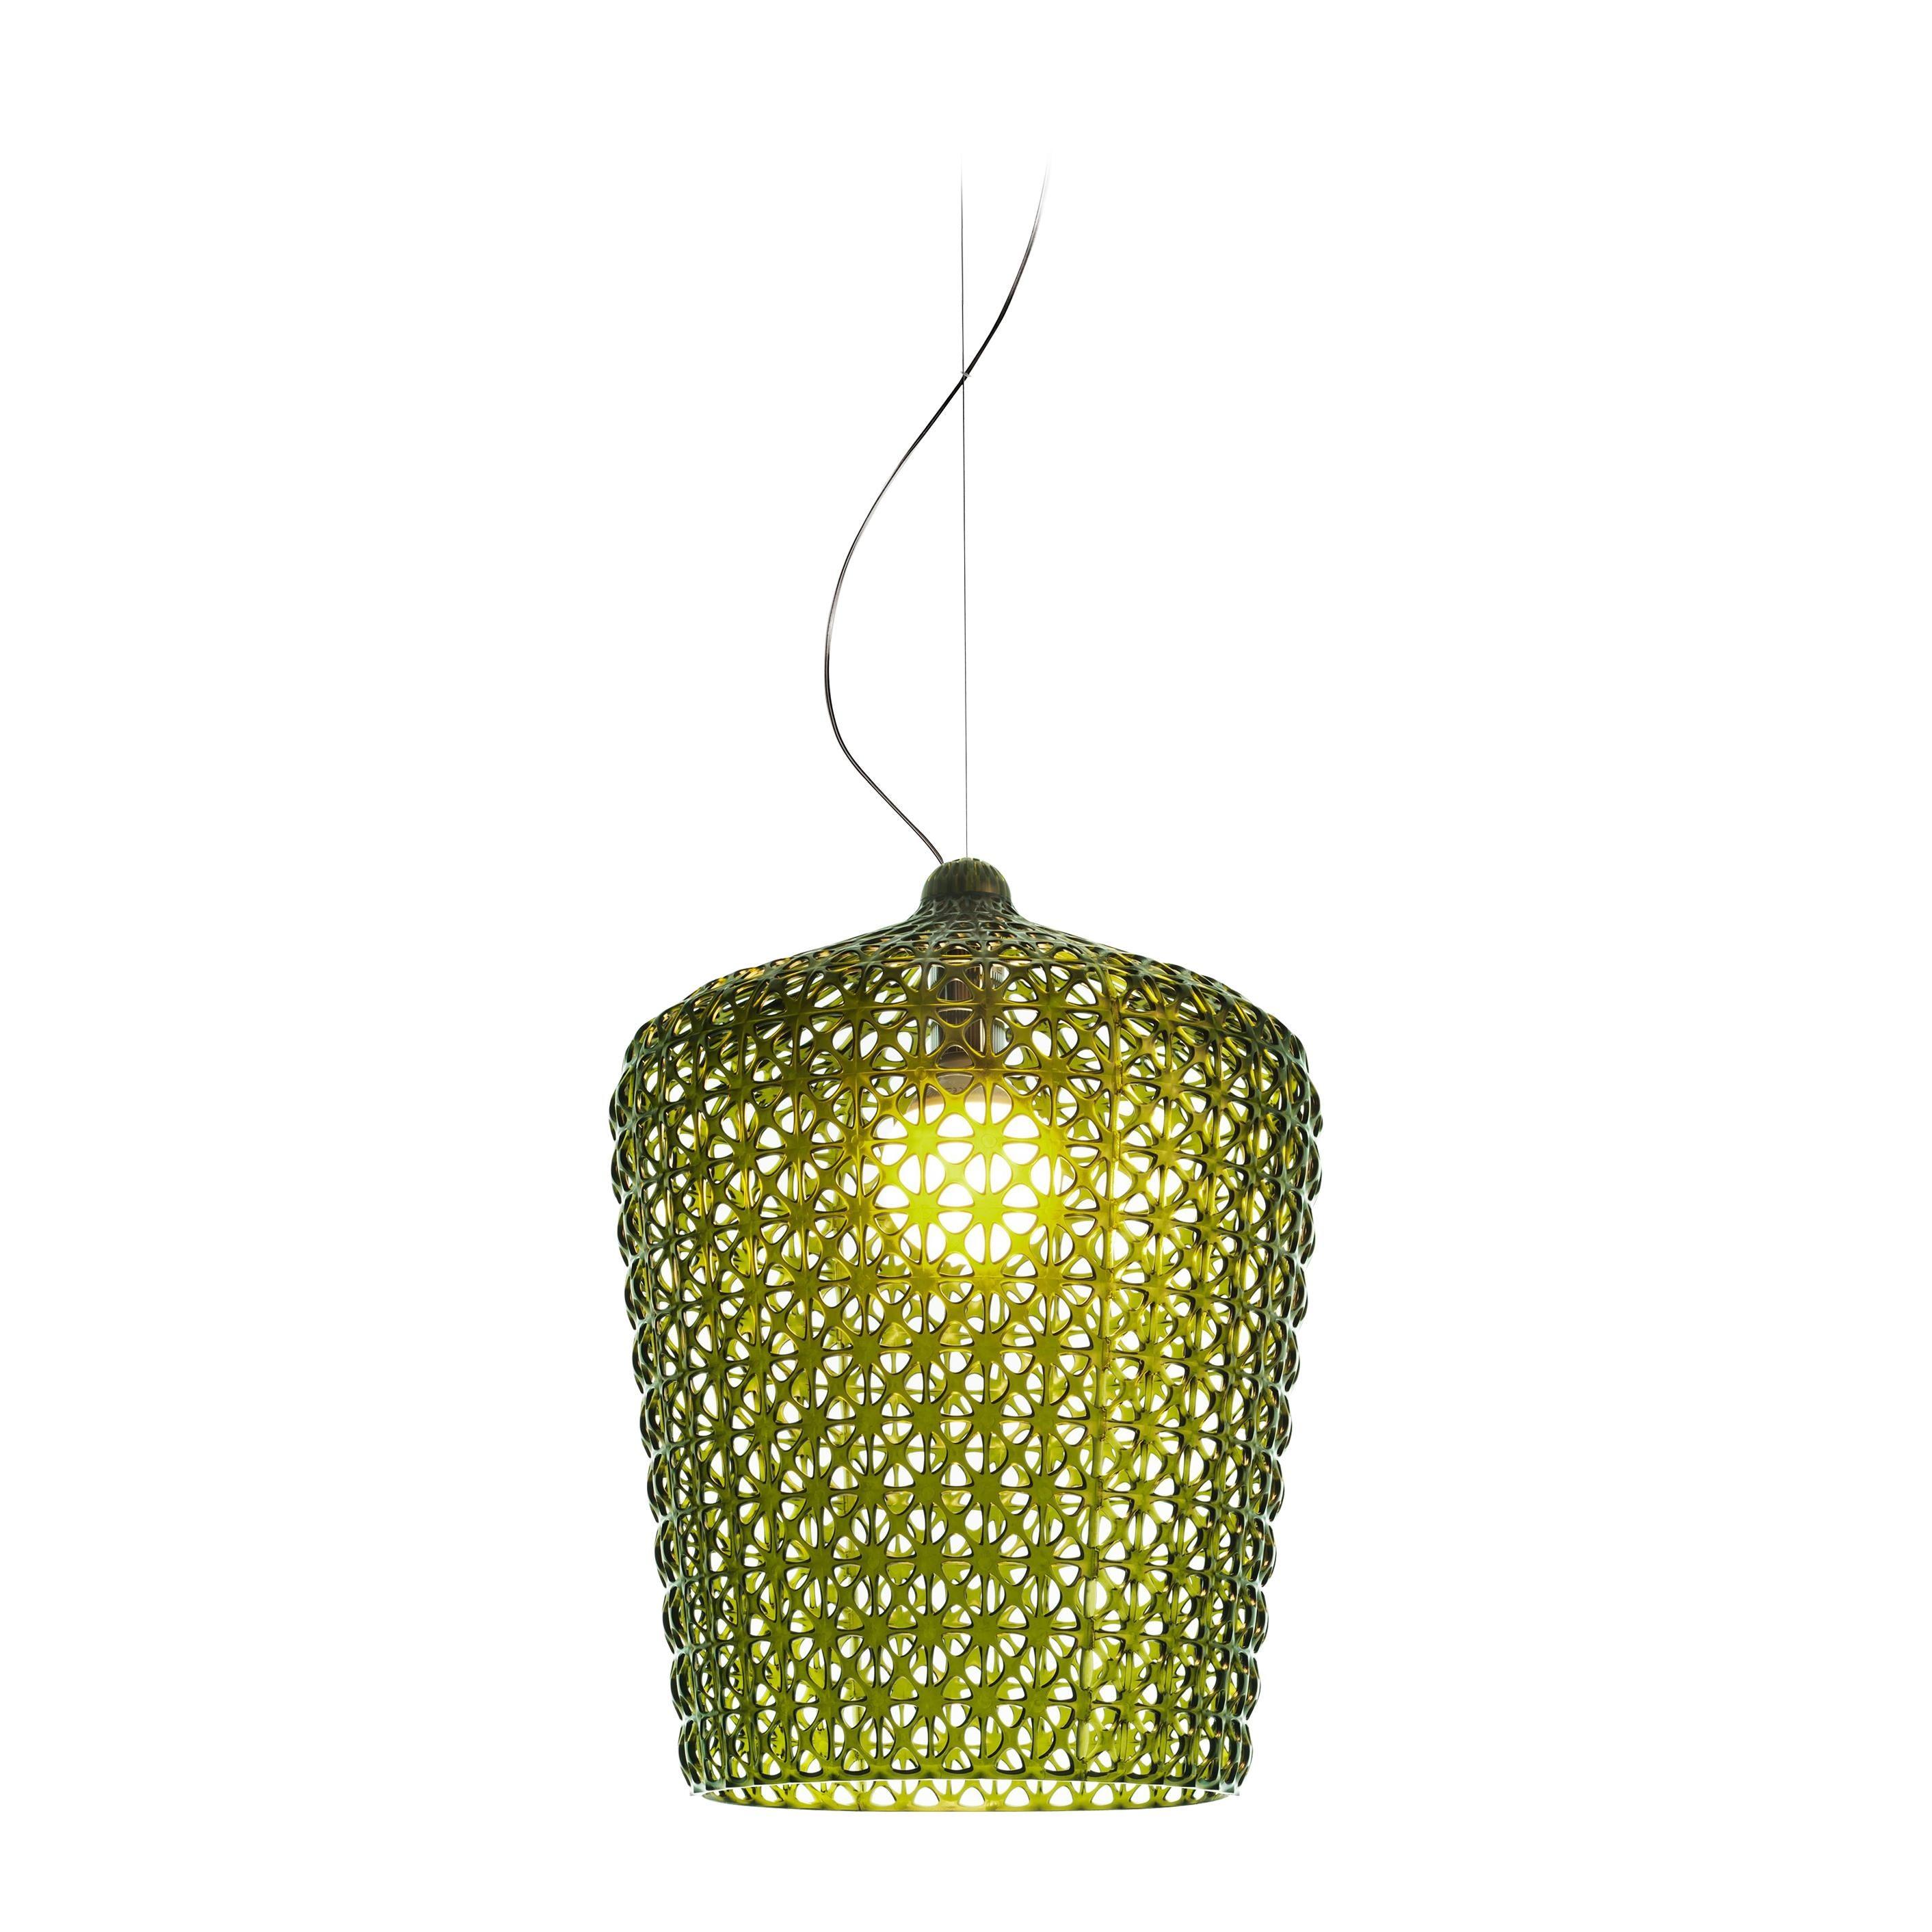 Kartell Kabuki Pendant Light in Green by Ferruccio Laviani